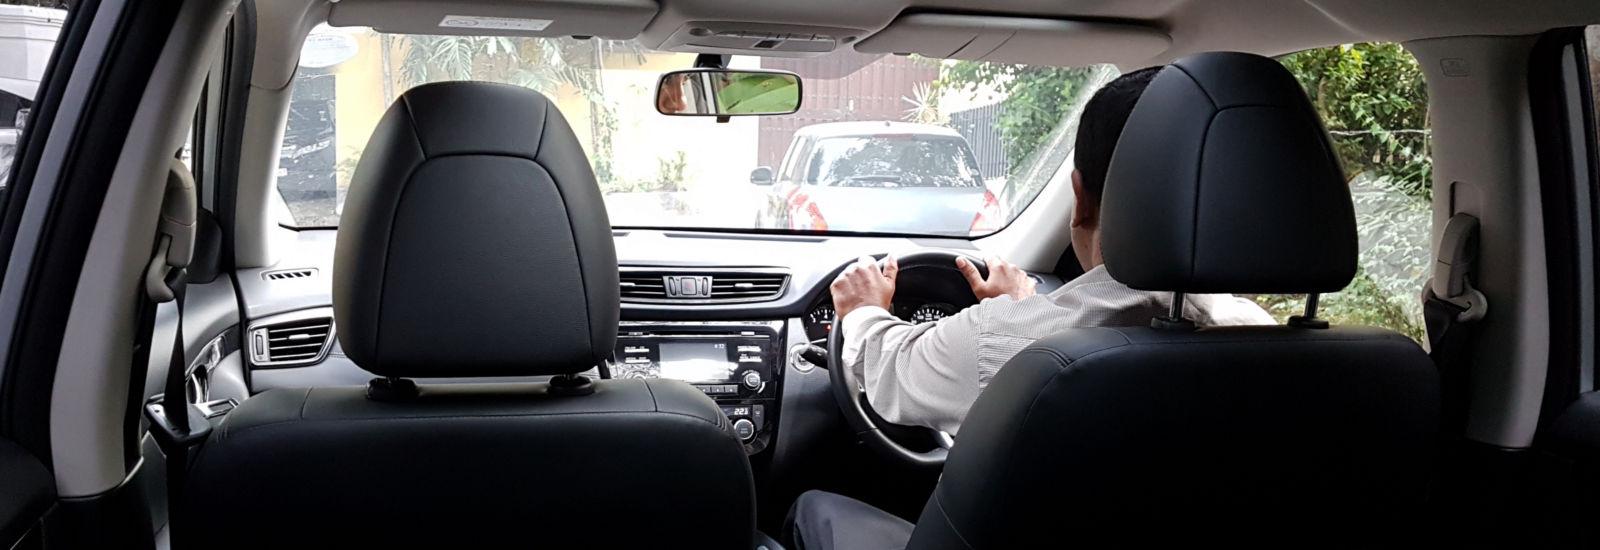 Sri Lanka Car Rental | Malkey Rent A Car Colombo | Official Site